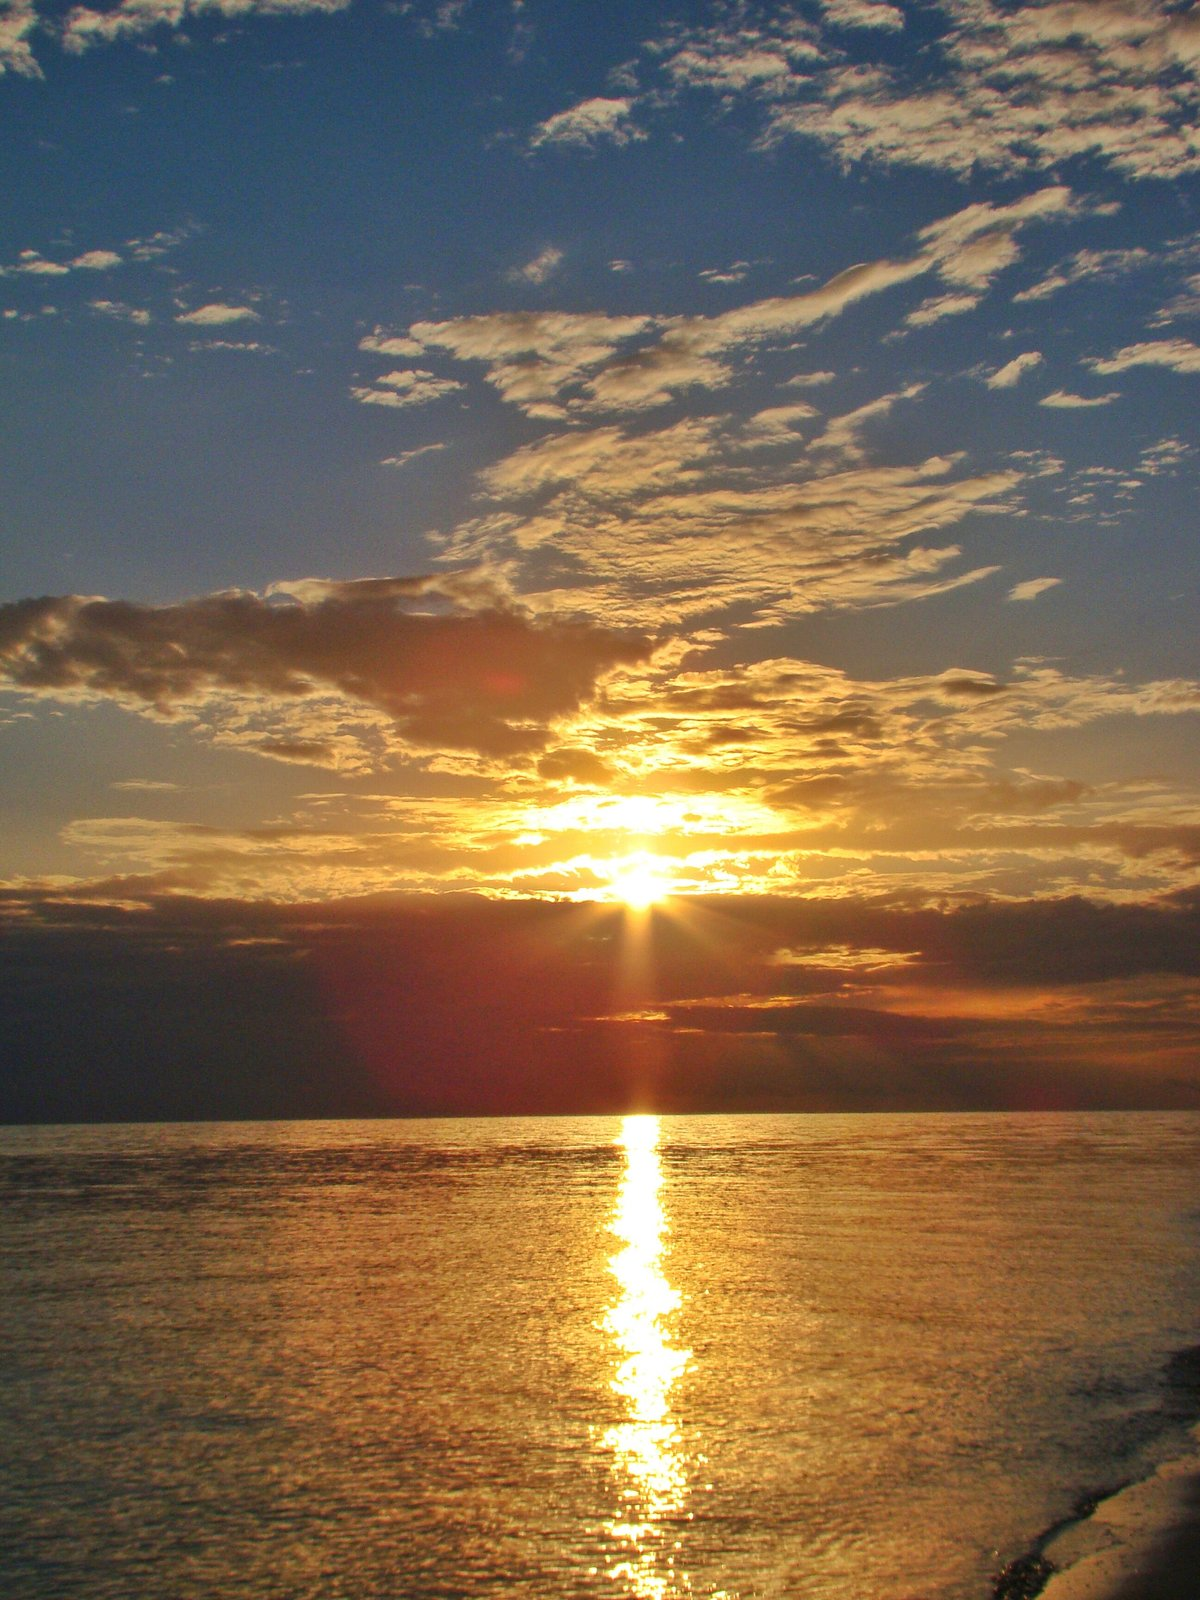 Фотографирование восхода и заката солнца